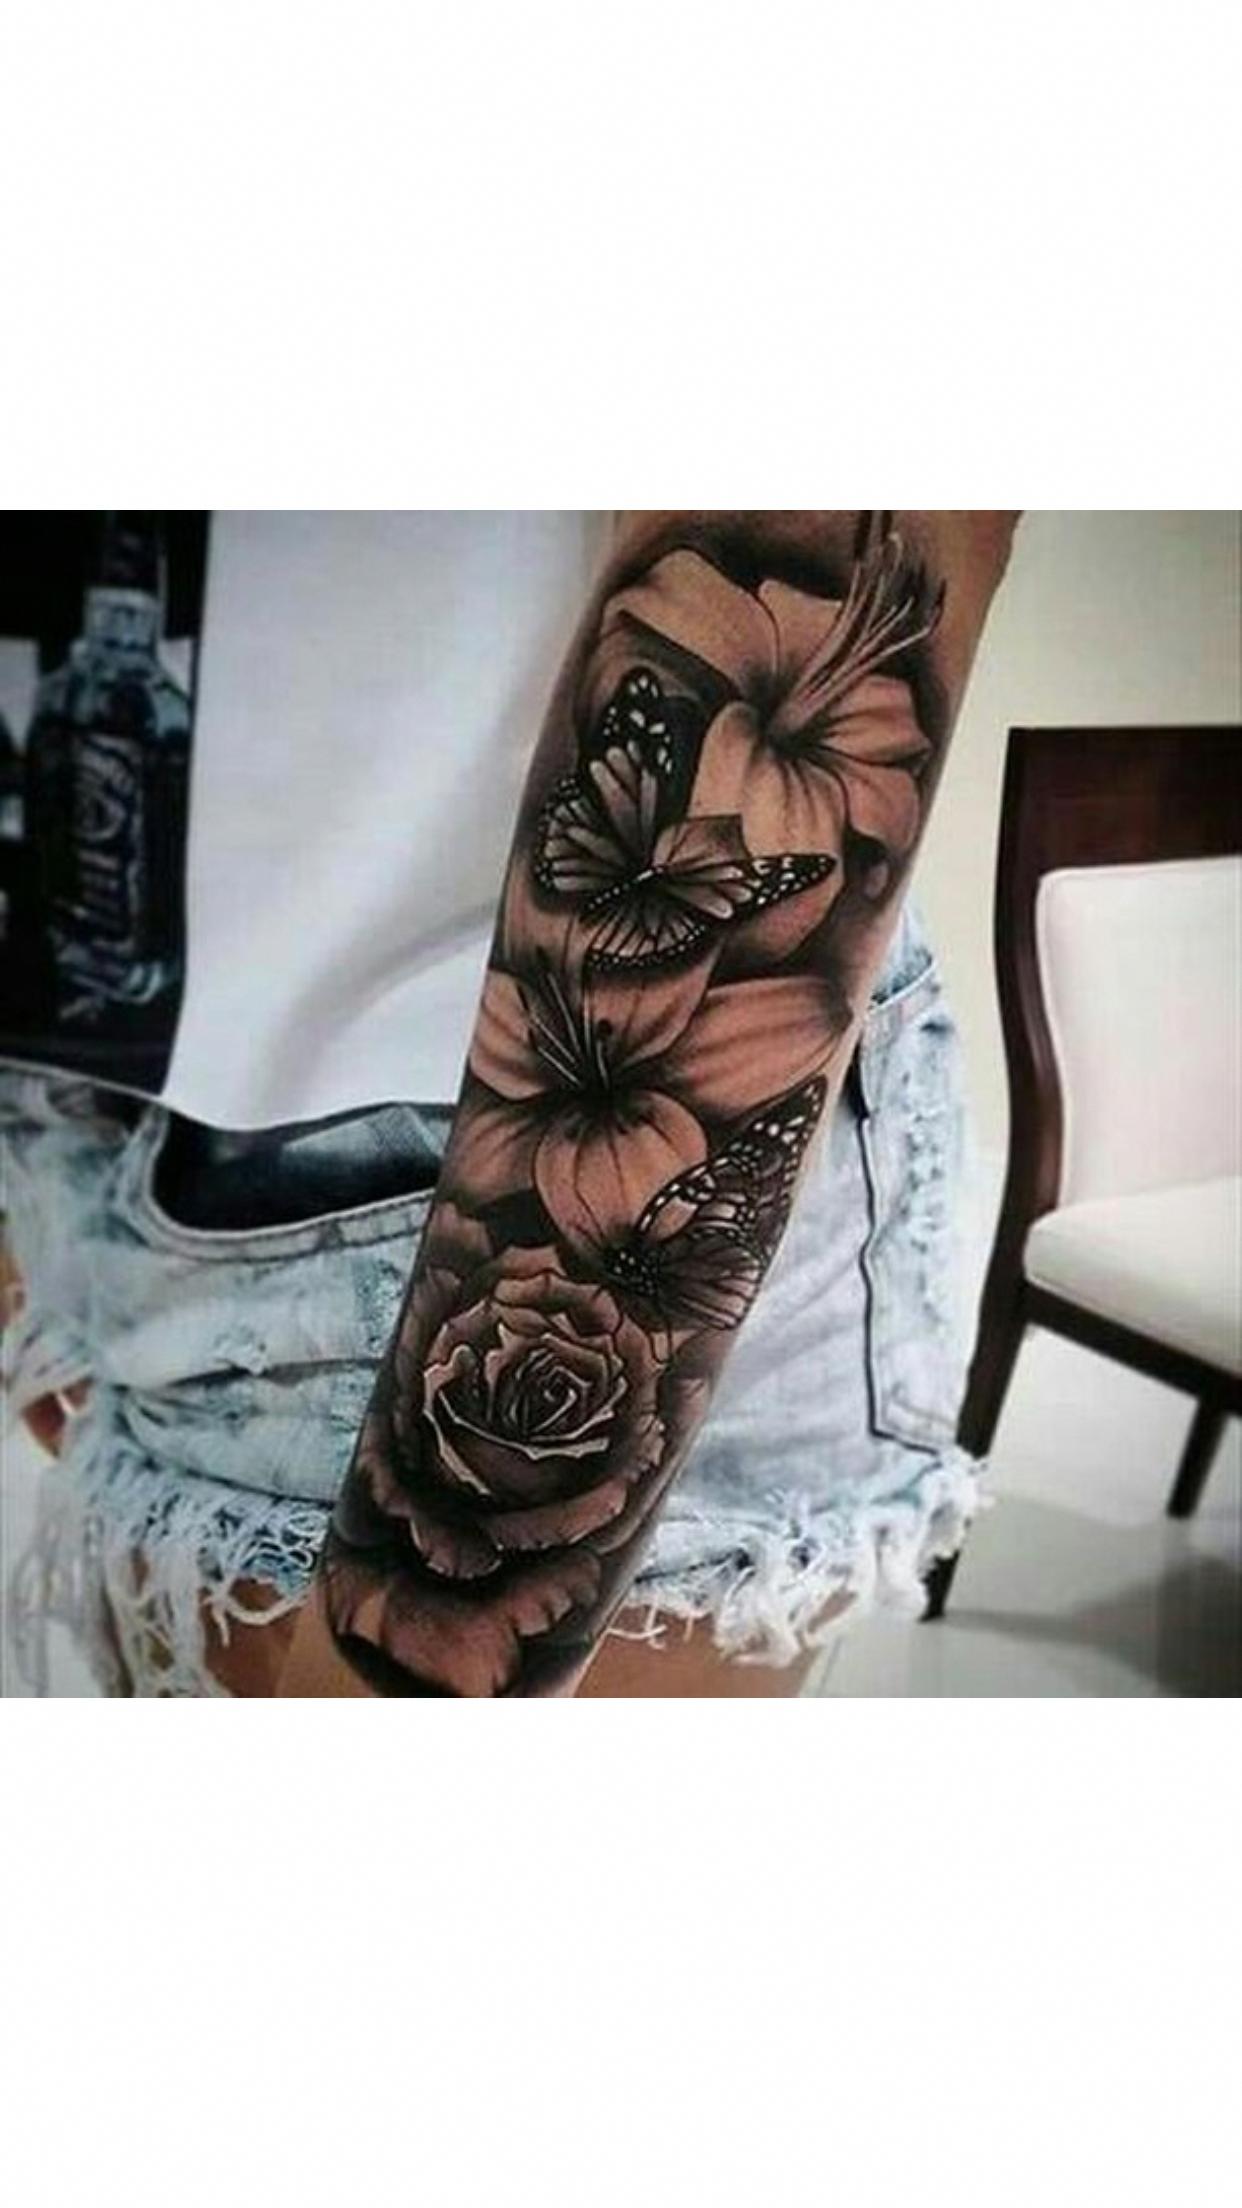 Lower Back Cover Up Tattoos Lowerbacktattoos Stylist Tattoos Tattoos Forarm Tattoos